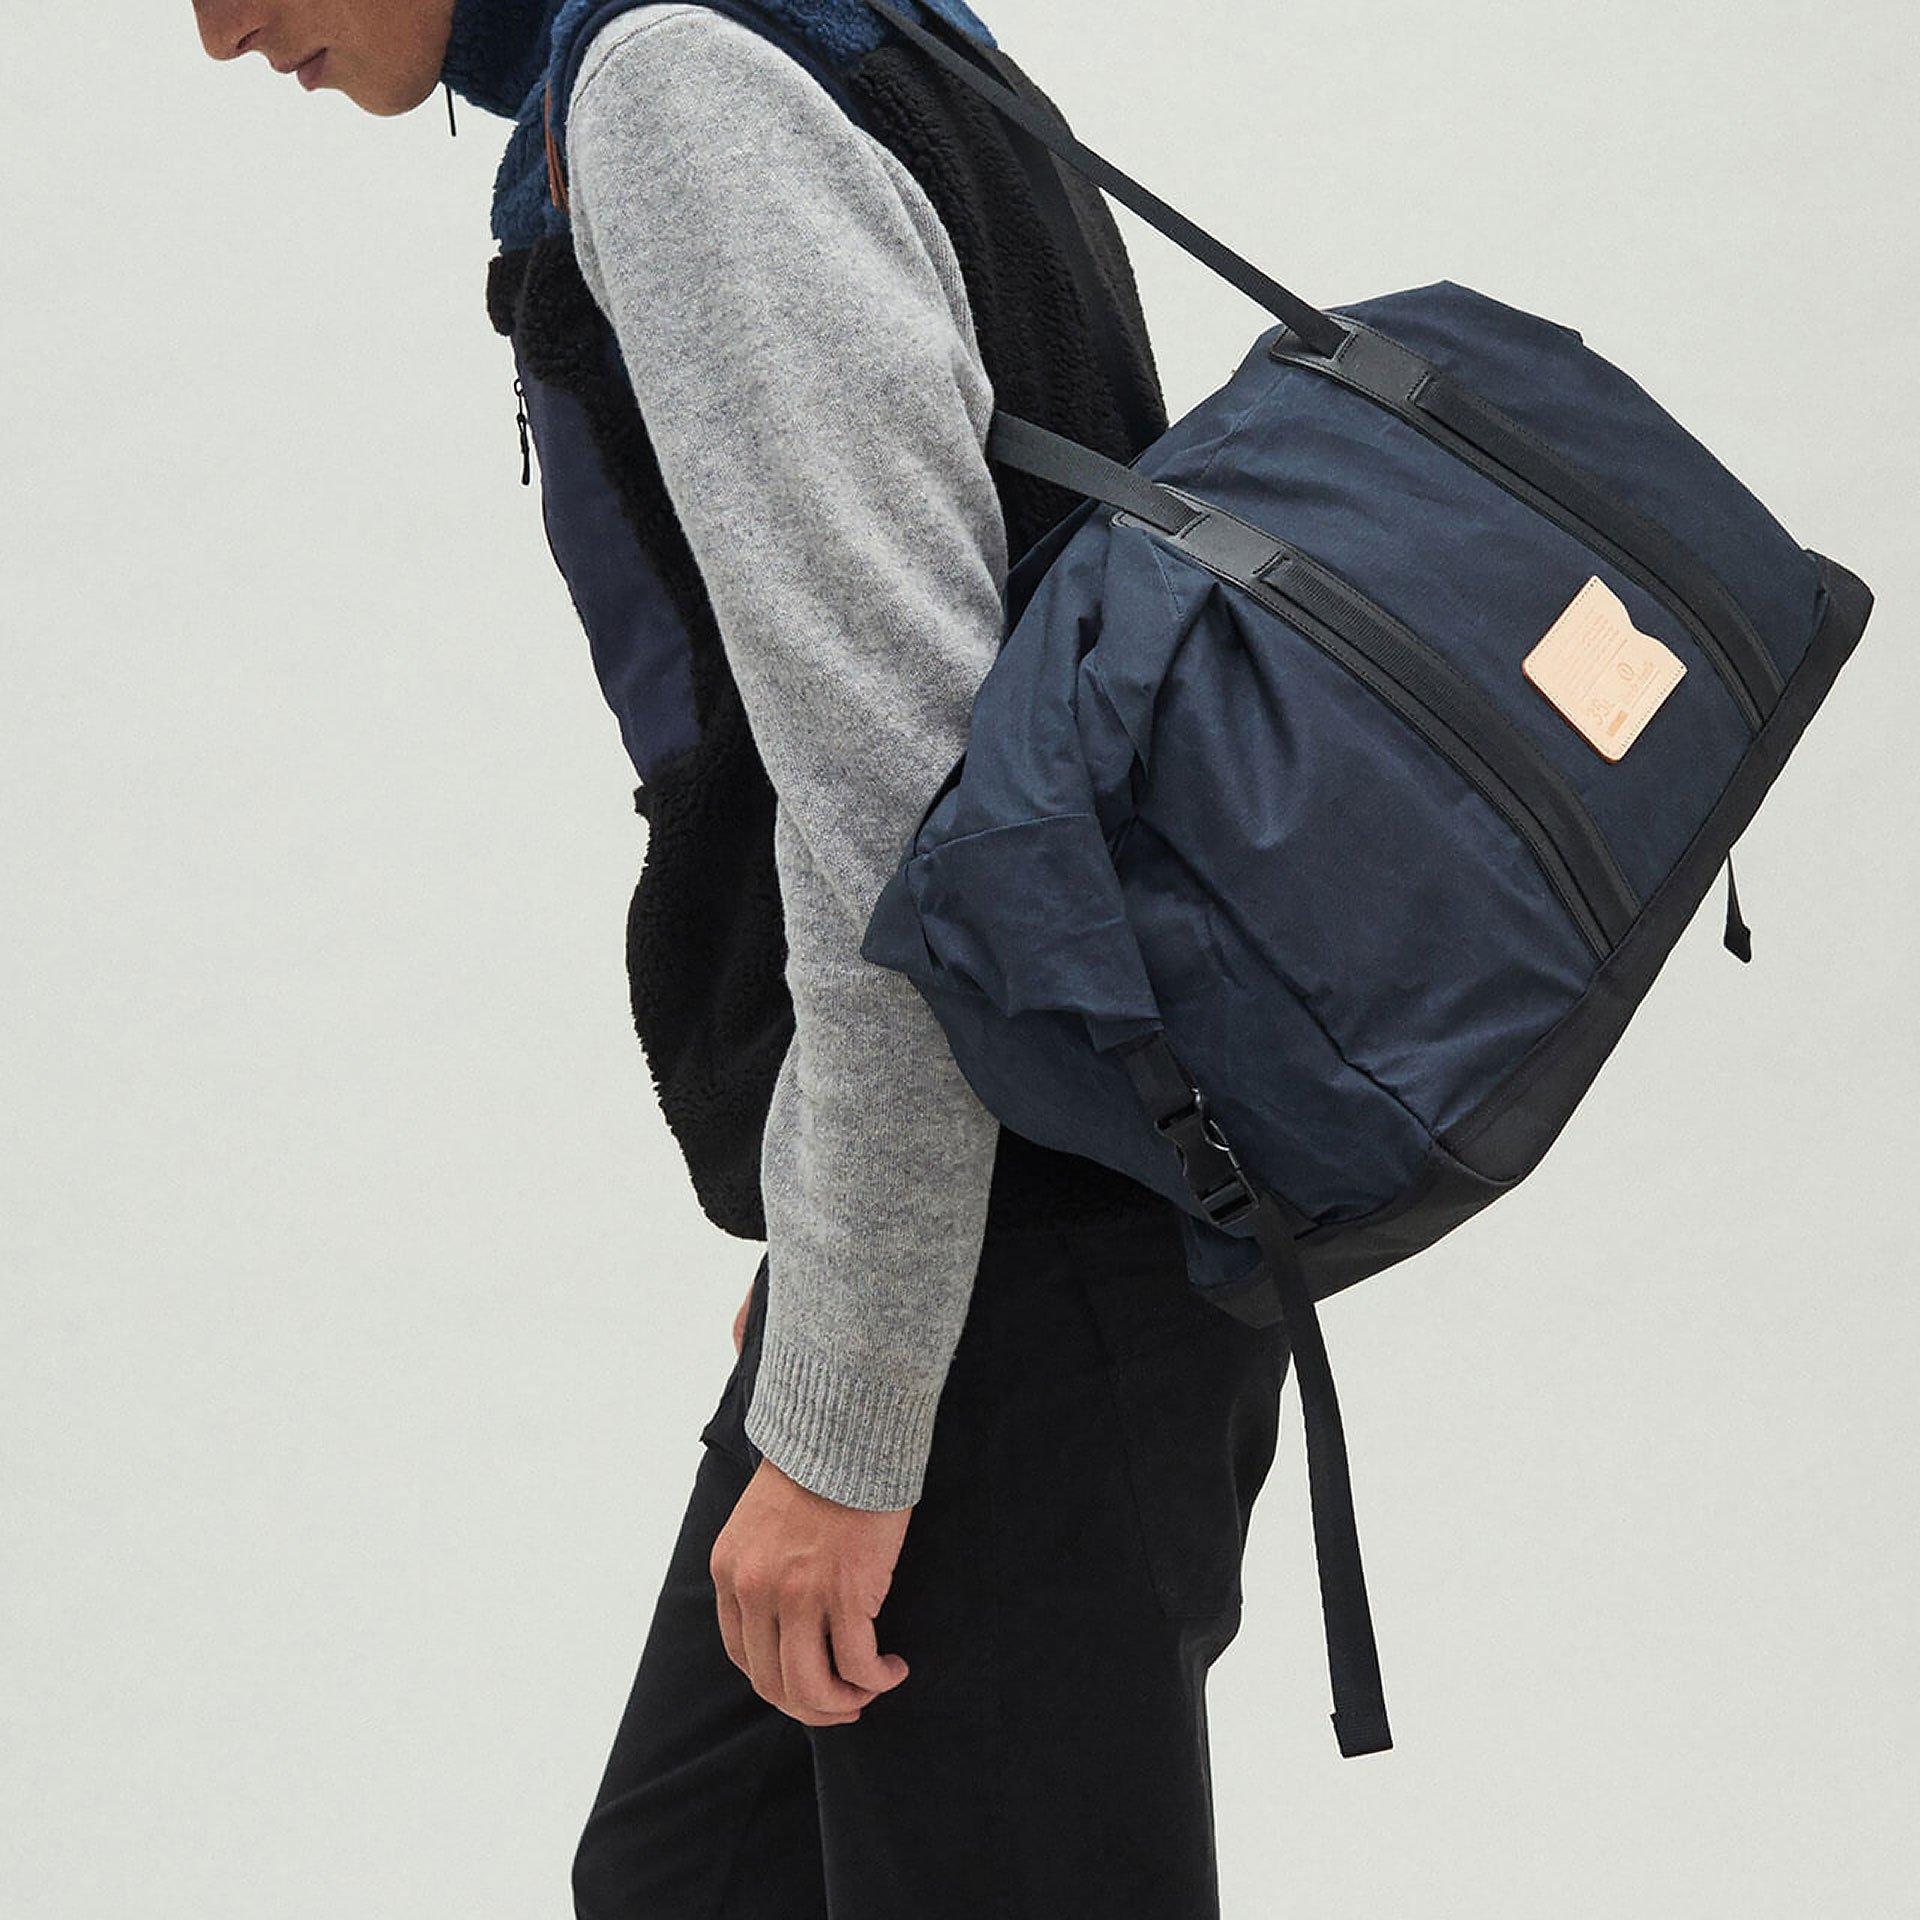 35L Baroud Travel bag - Burgundy (image n°5)